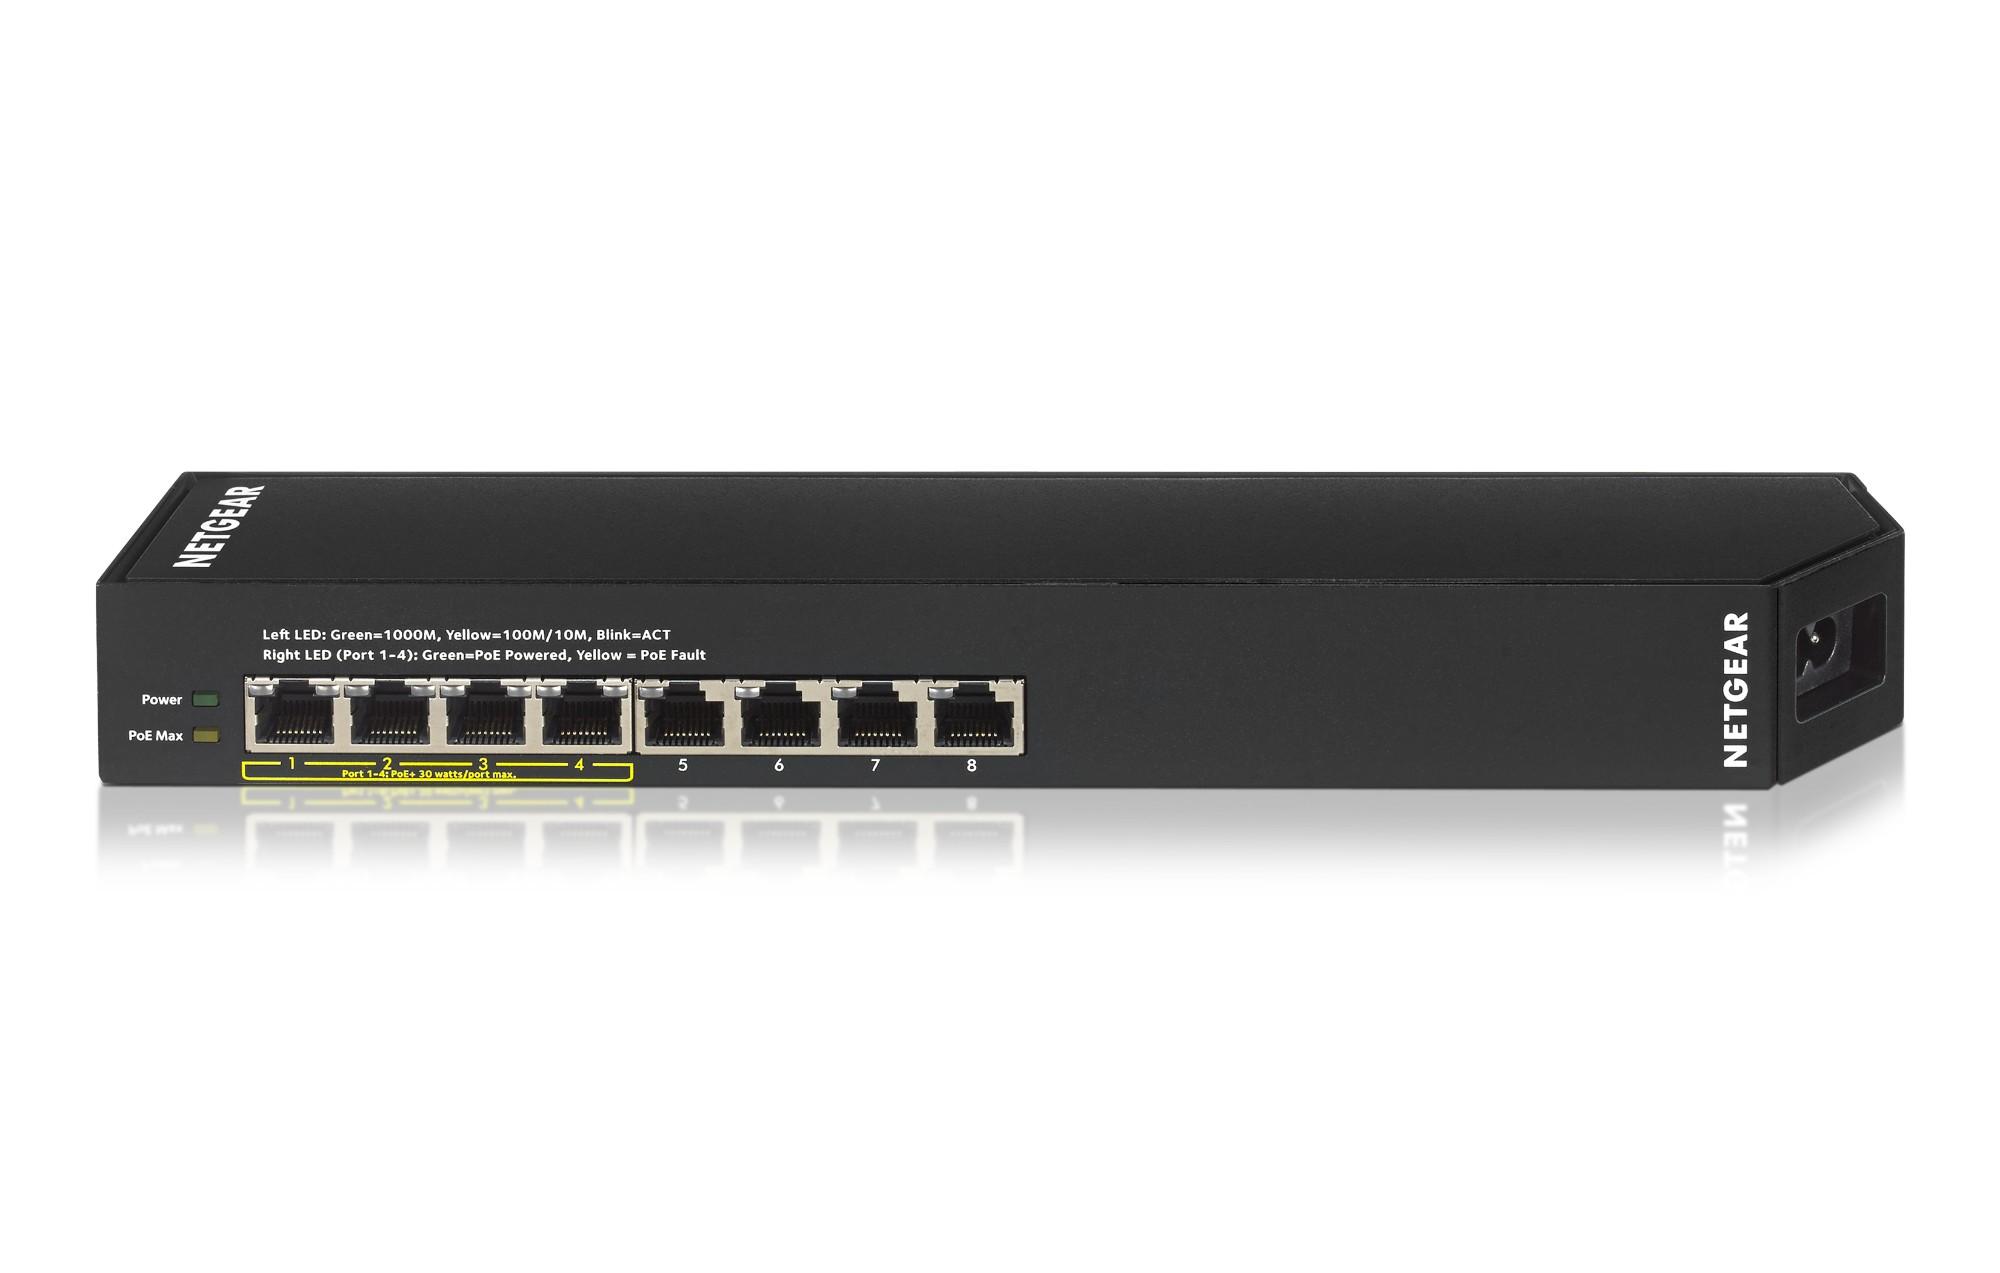 Netgear GSS108EPP Managed L2 Gigabit Ethernet (10/100/1000) Power over Ethernet (PoE) Black